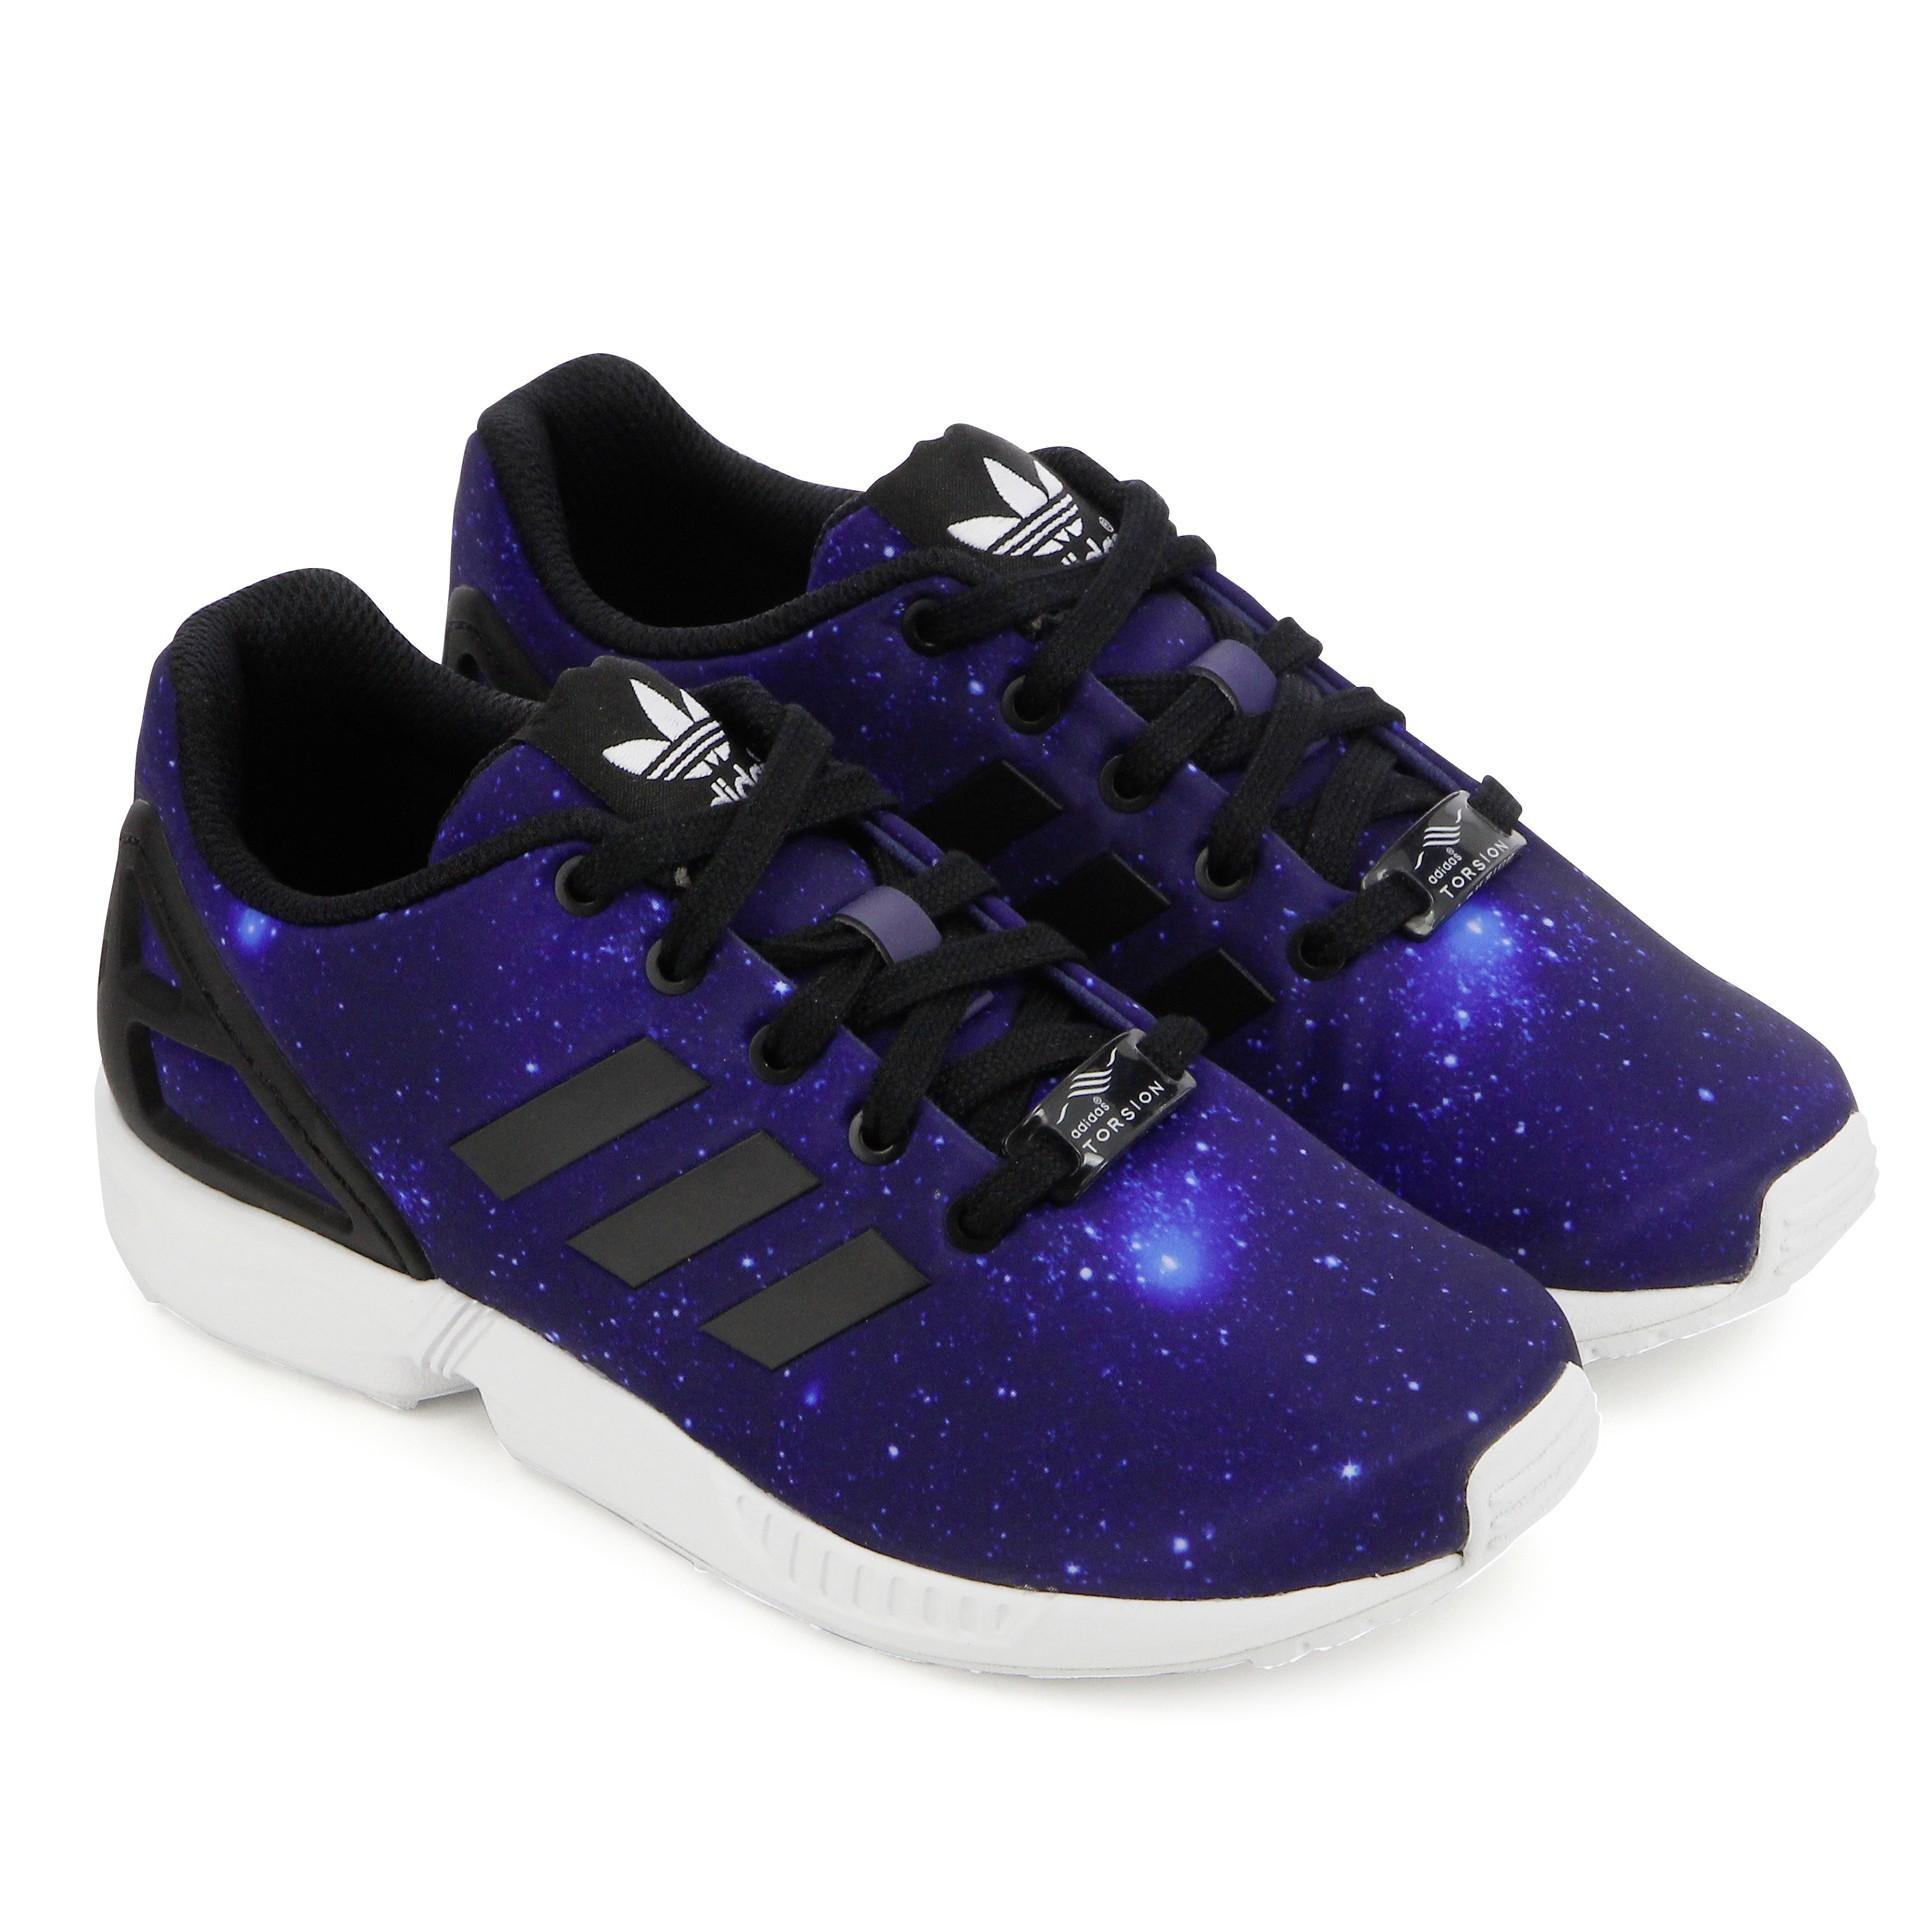 adidas zx flux galaxy pas cher